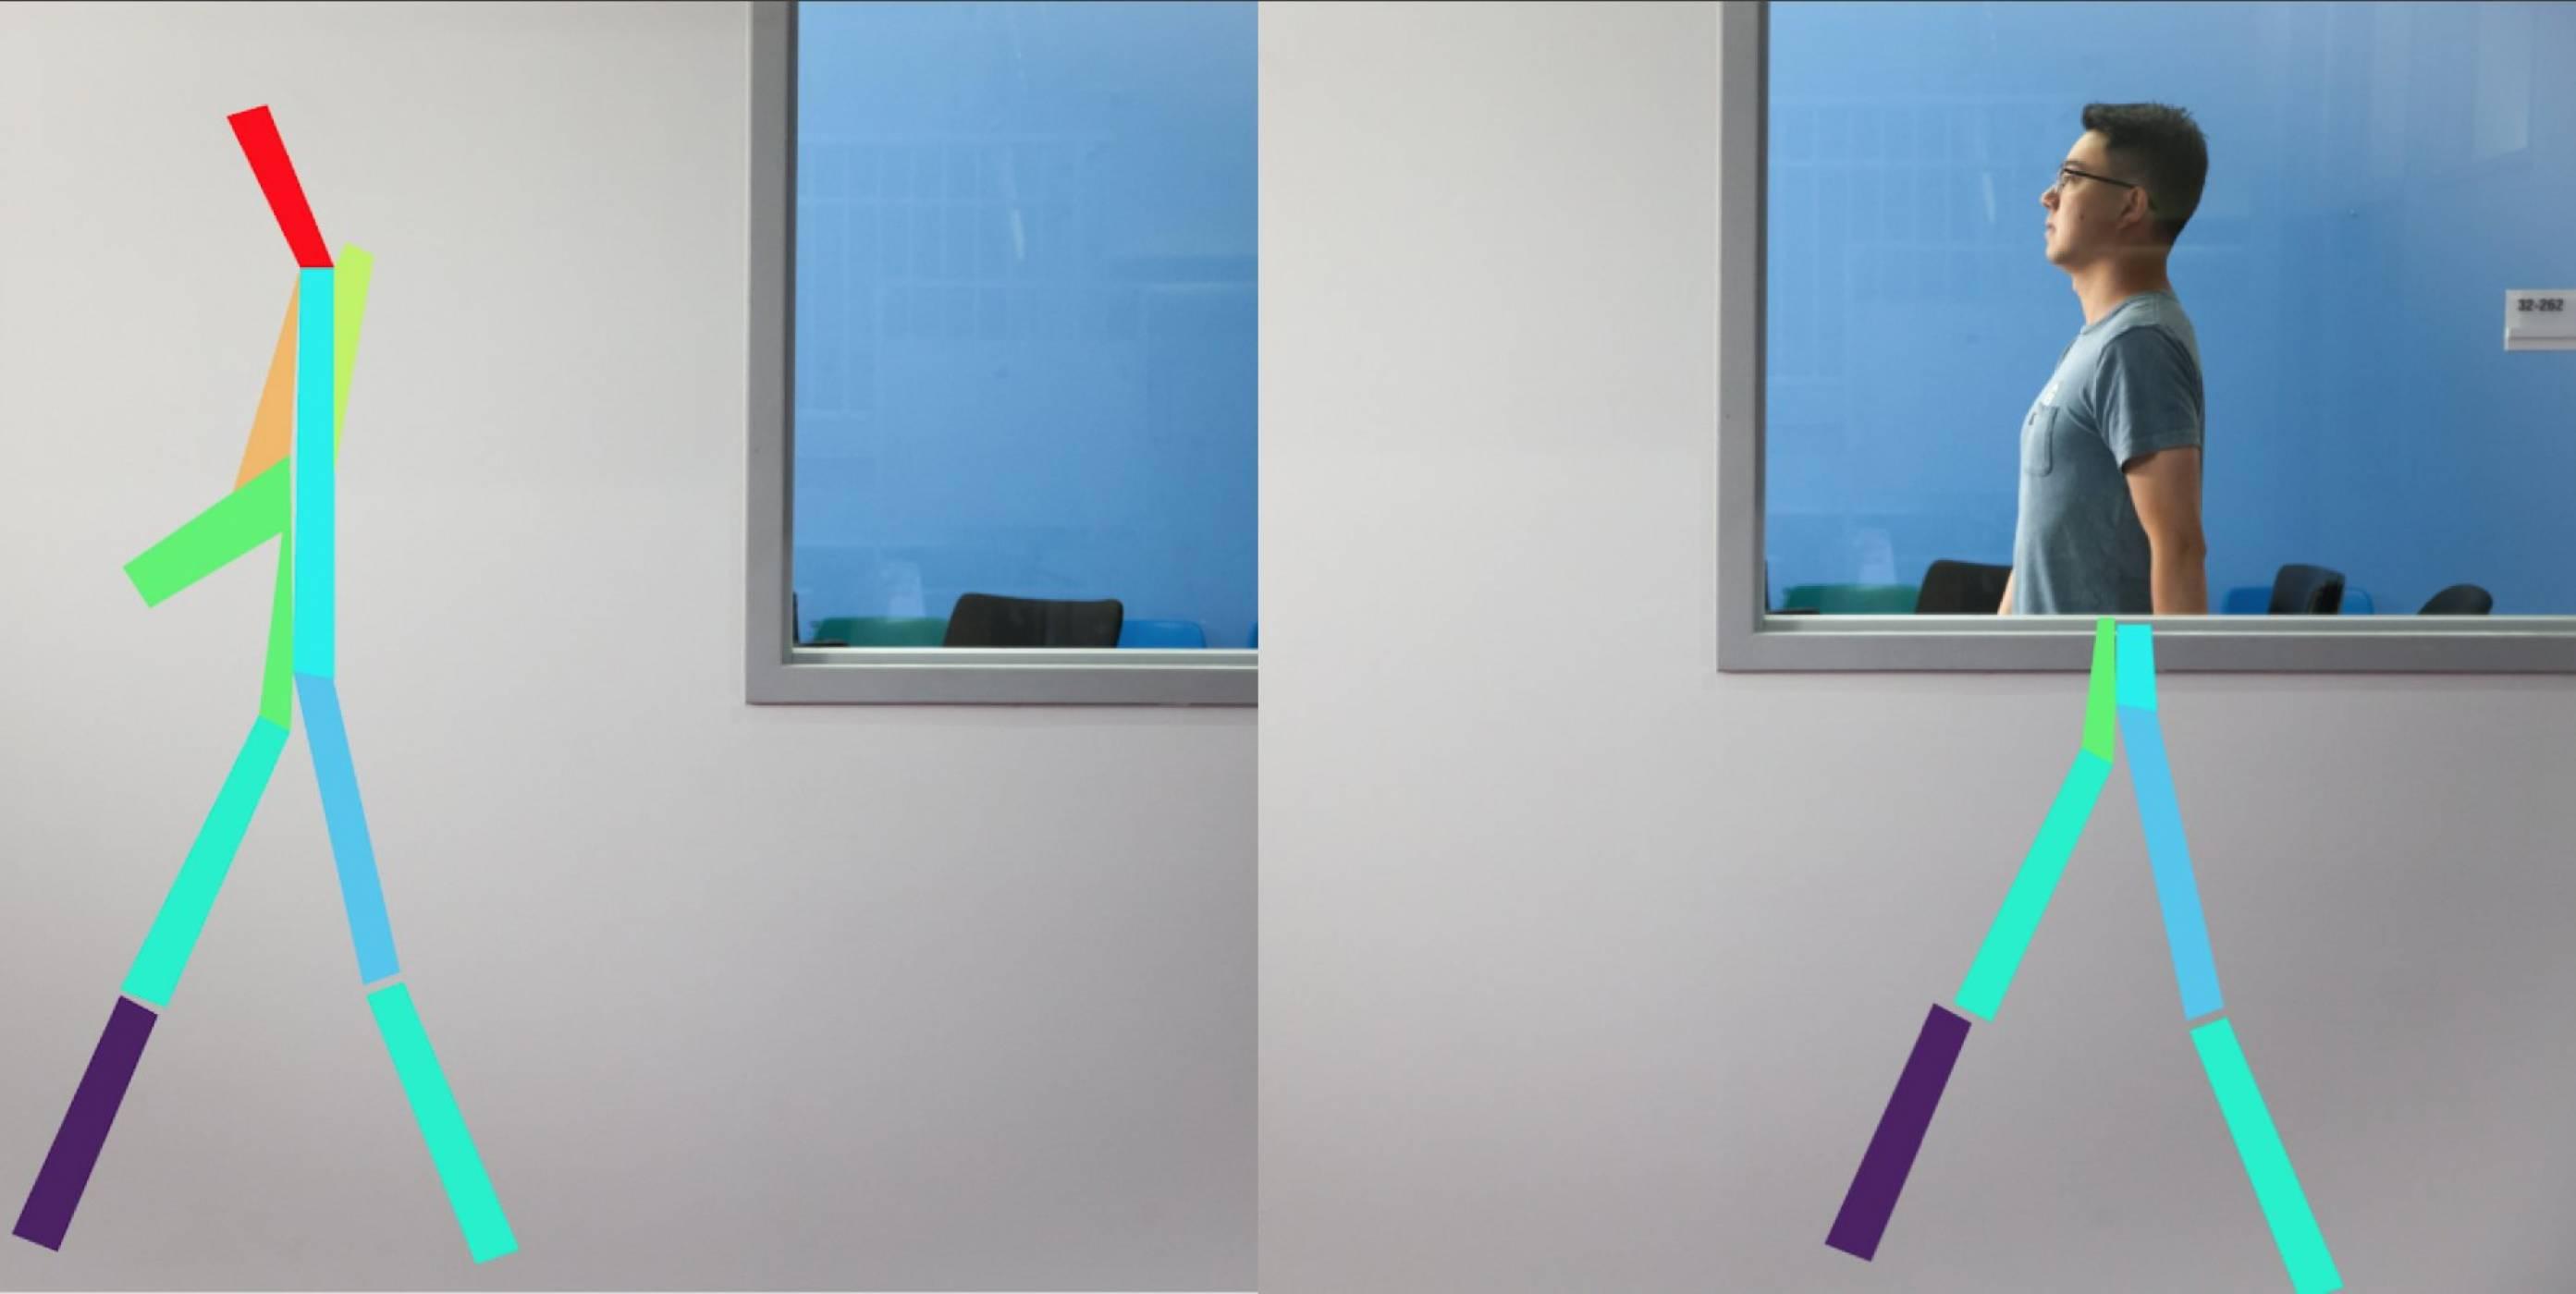 Jason Dorfman / MIT CSAIL